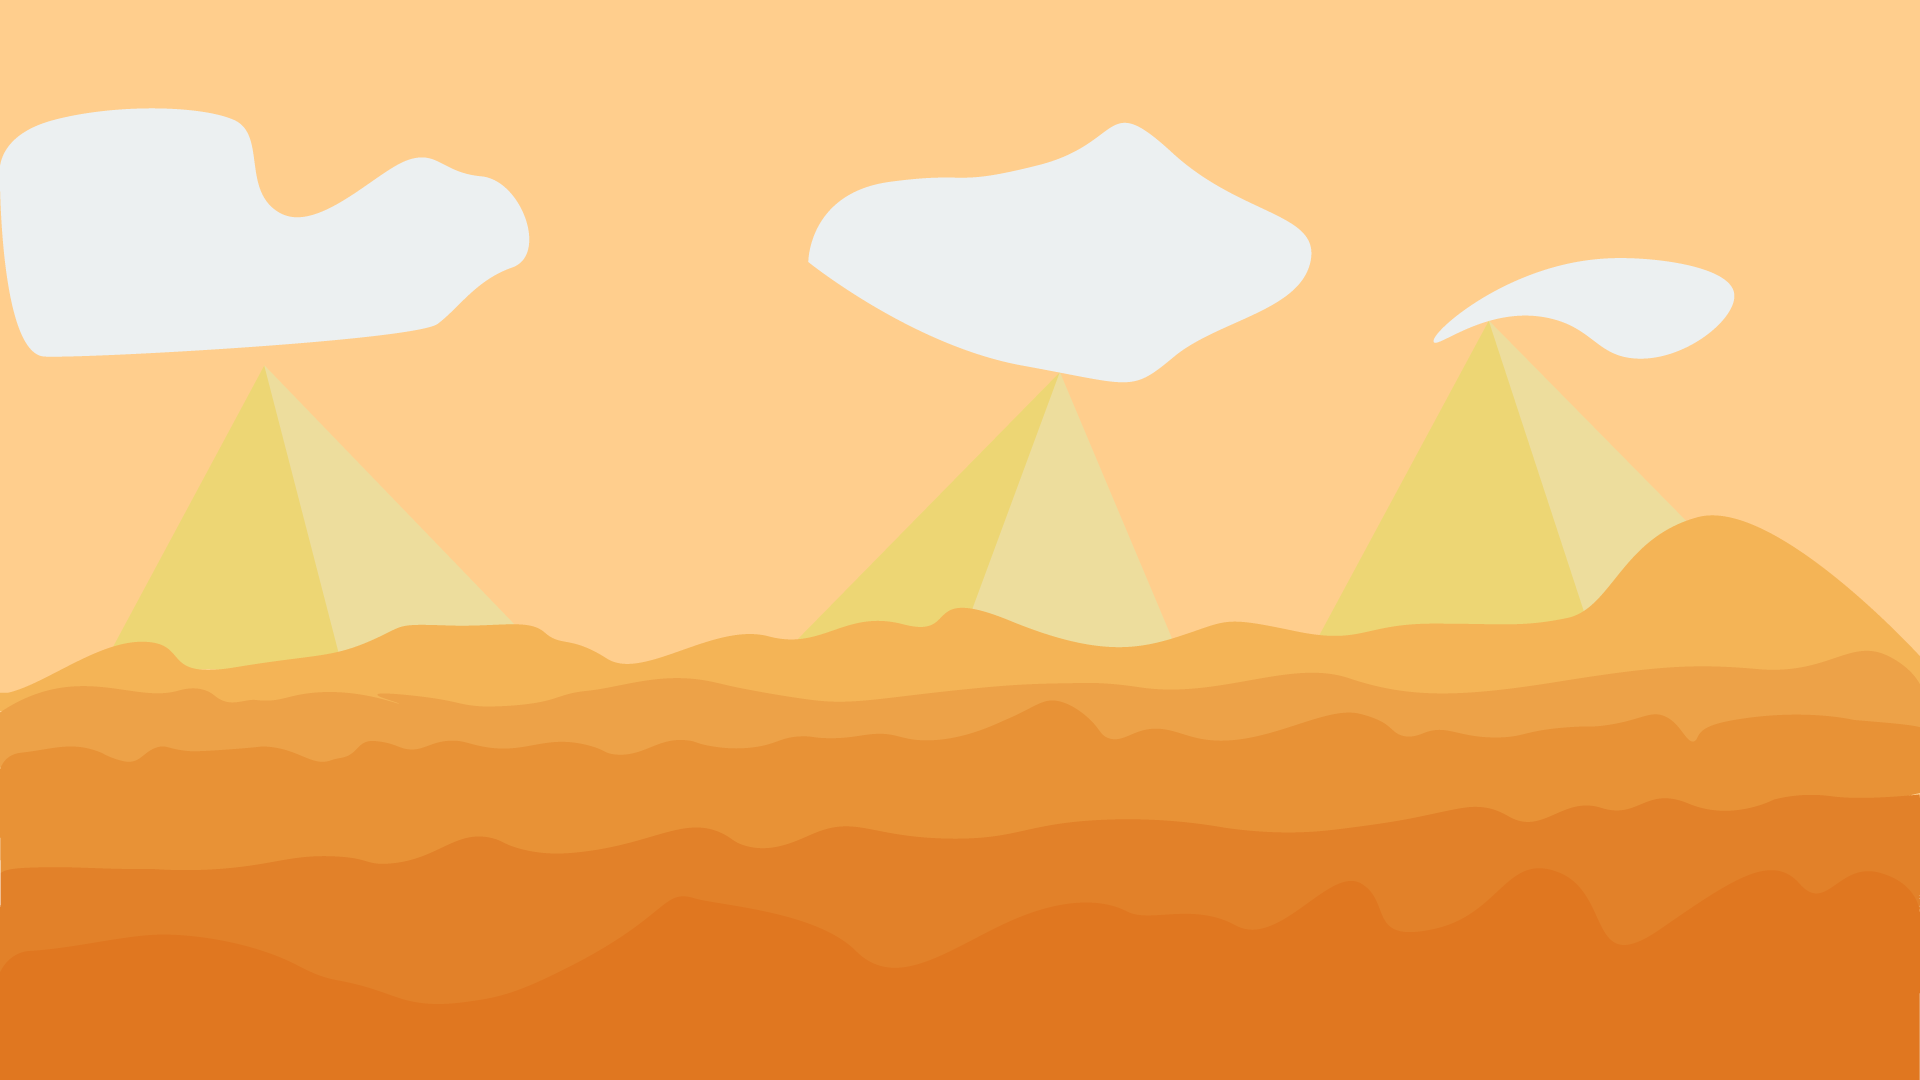 flat desert wallpaper by reynardo100 on deviantart